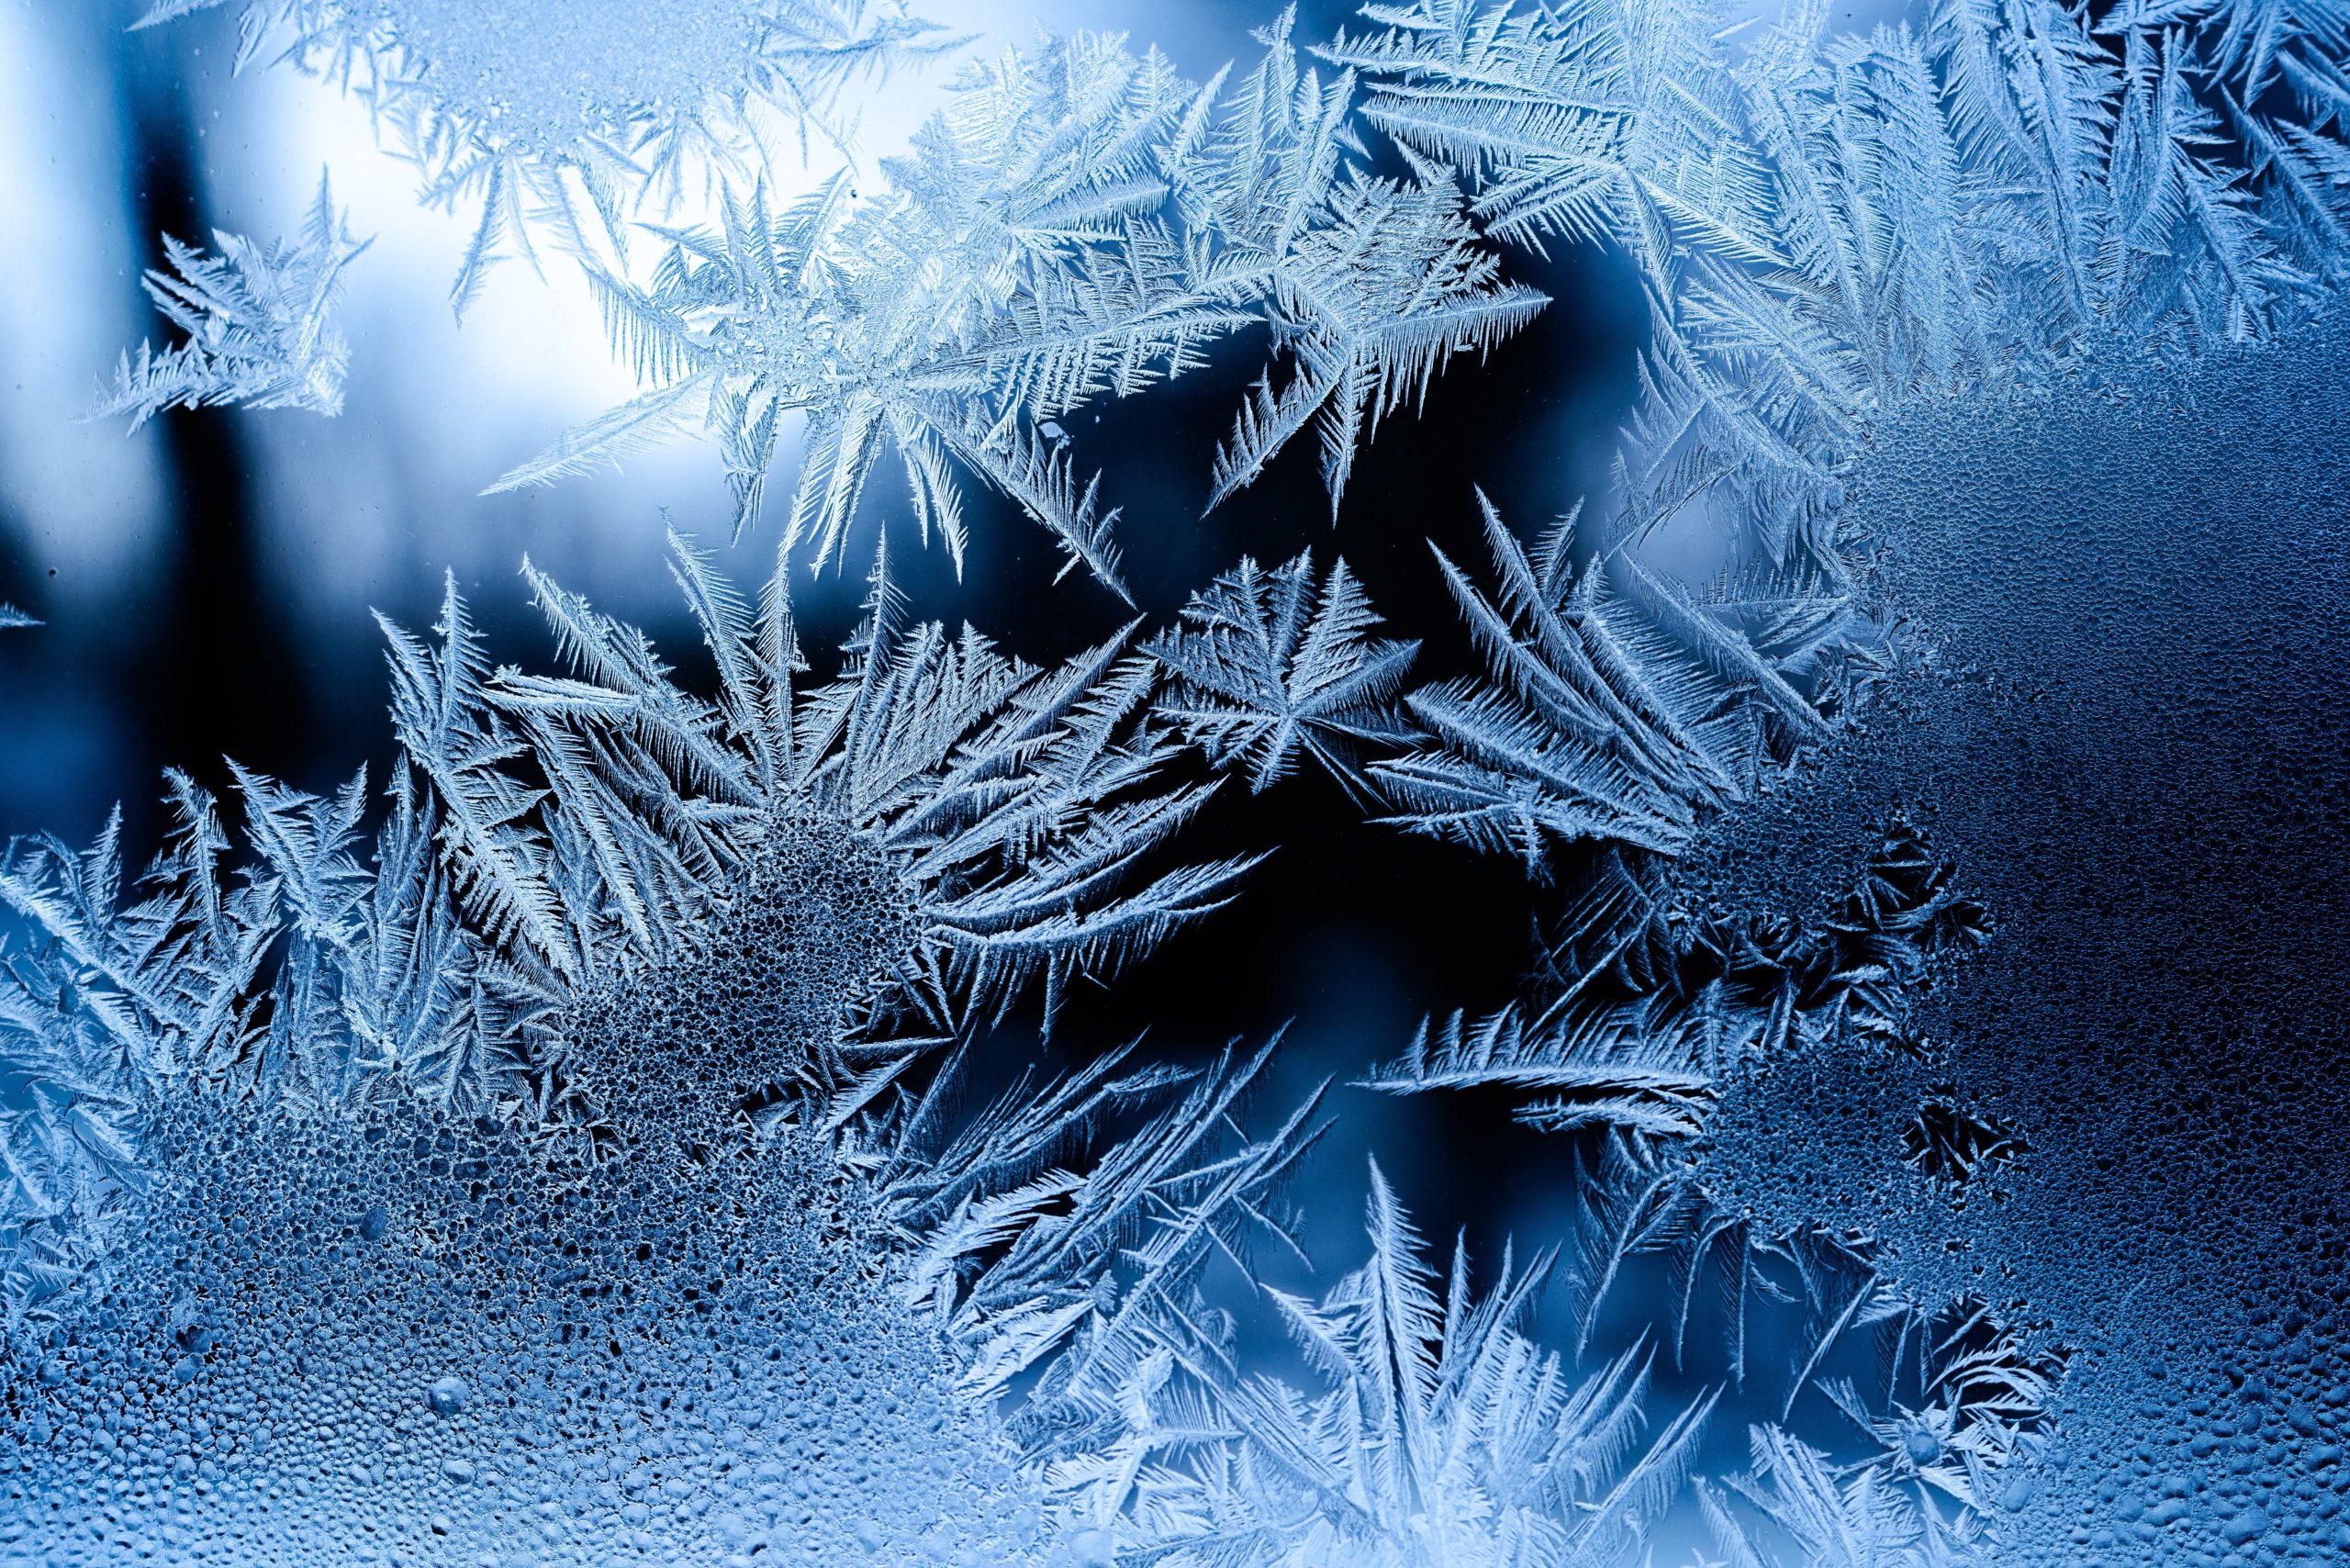 """Ice"" Photo by Osman Rana on Unsplash"